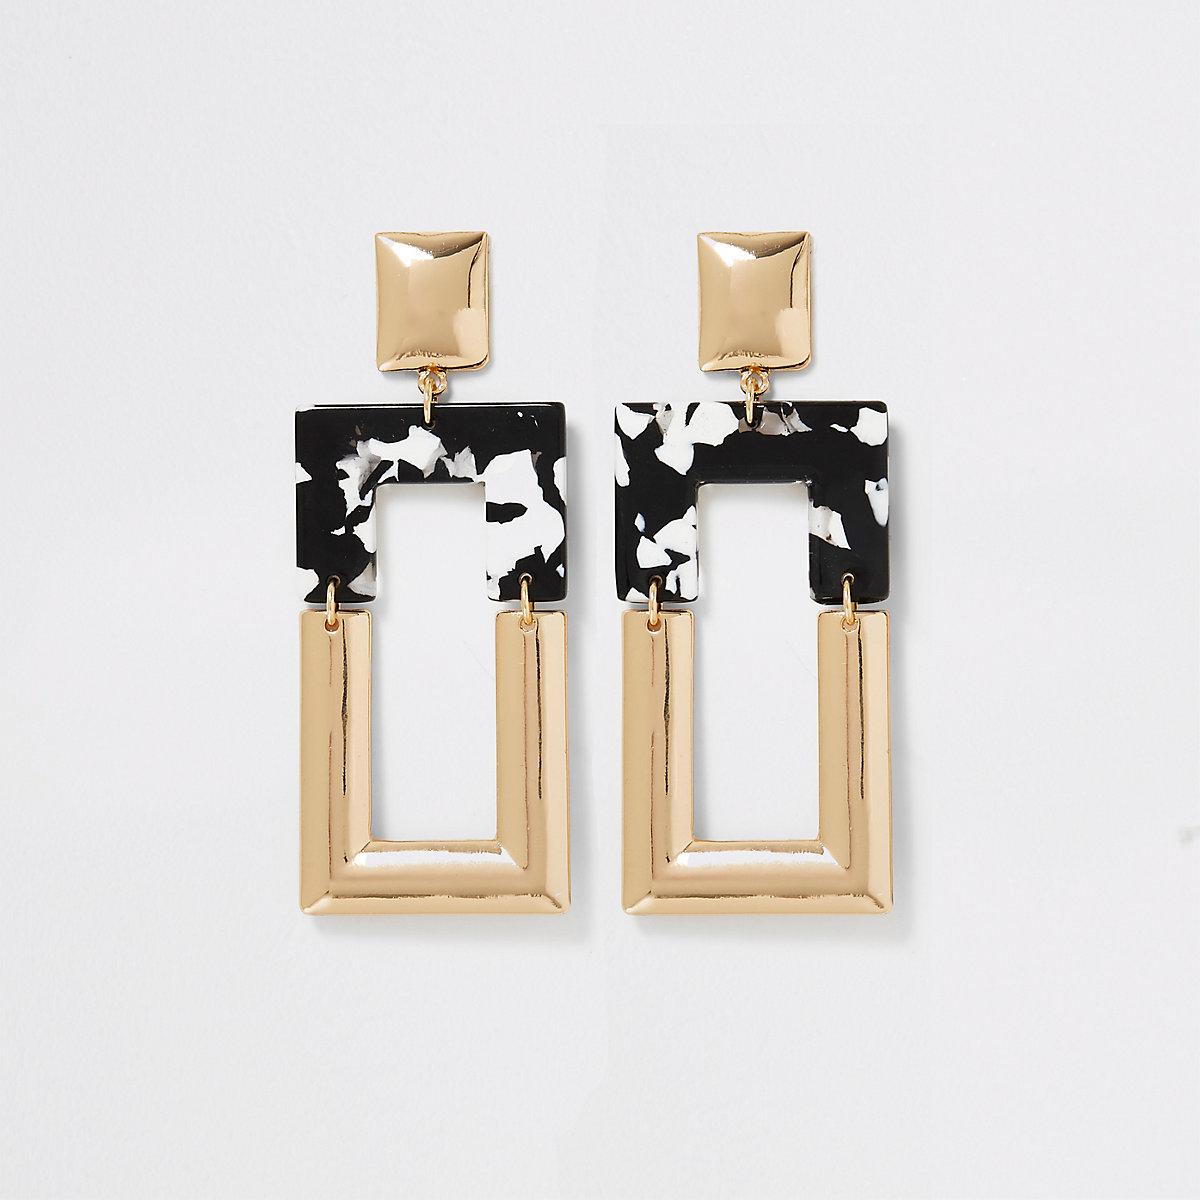 Gold color mono print square drop earrings